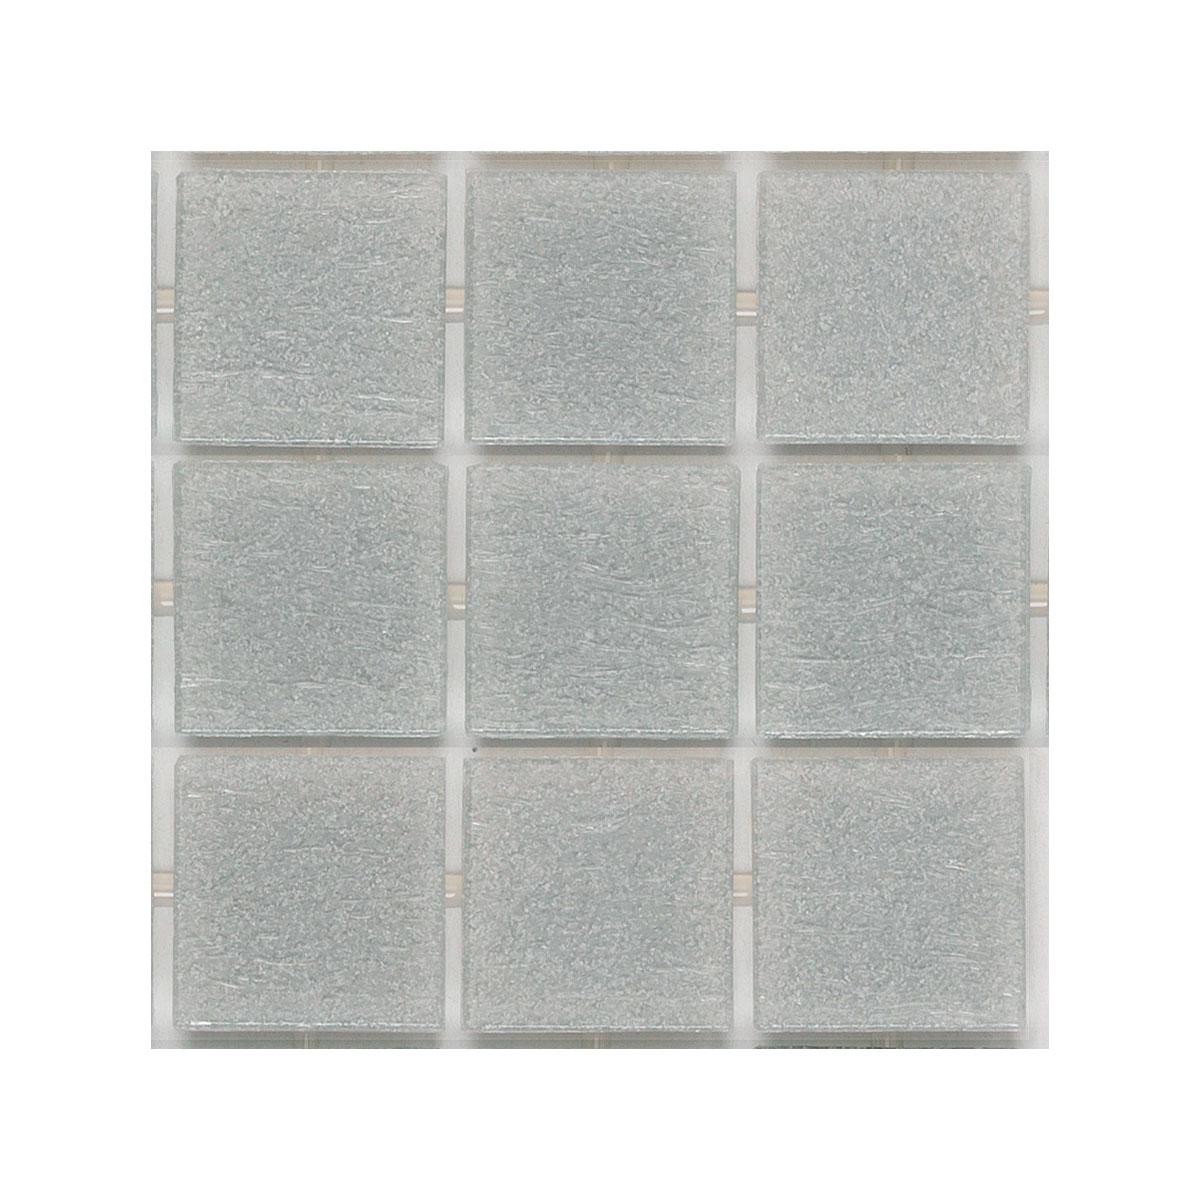 Vitreo - 152 grey - mosaic feature pool tiles - Stone3 Brisbane